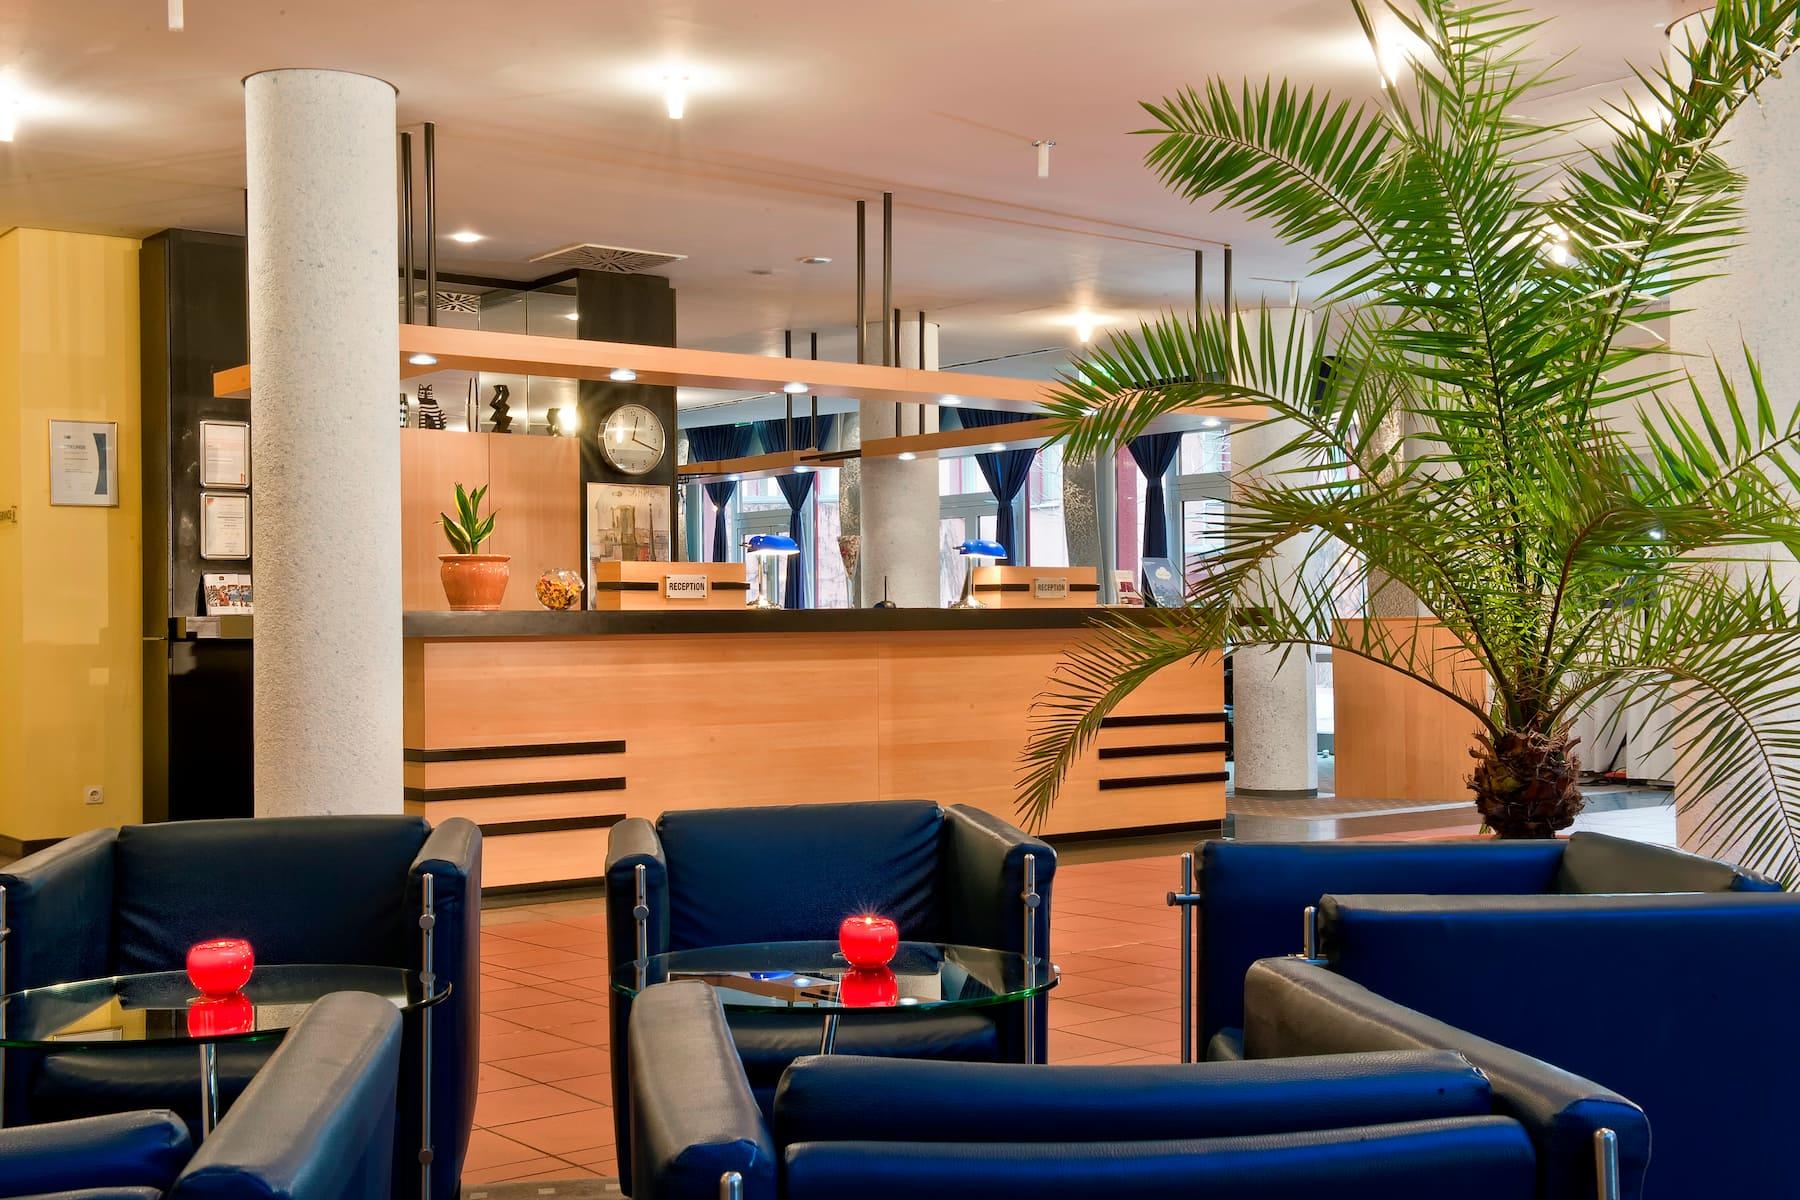 Tryp By Wyndham Halle Halle Saale Hotels De 06122